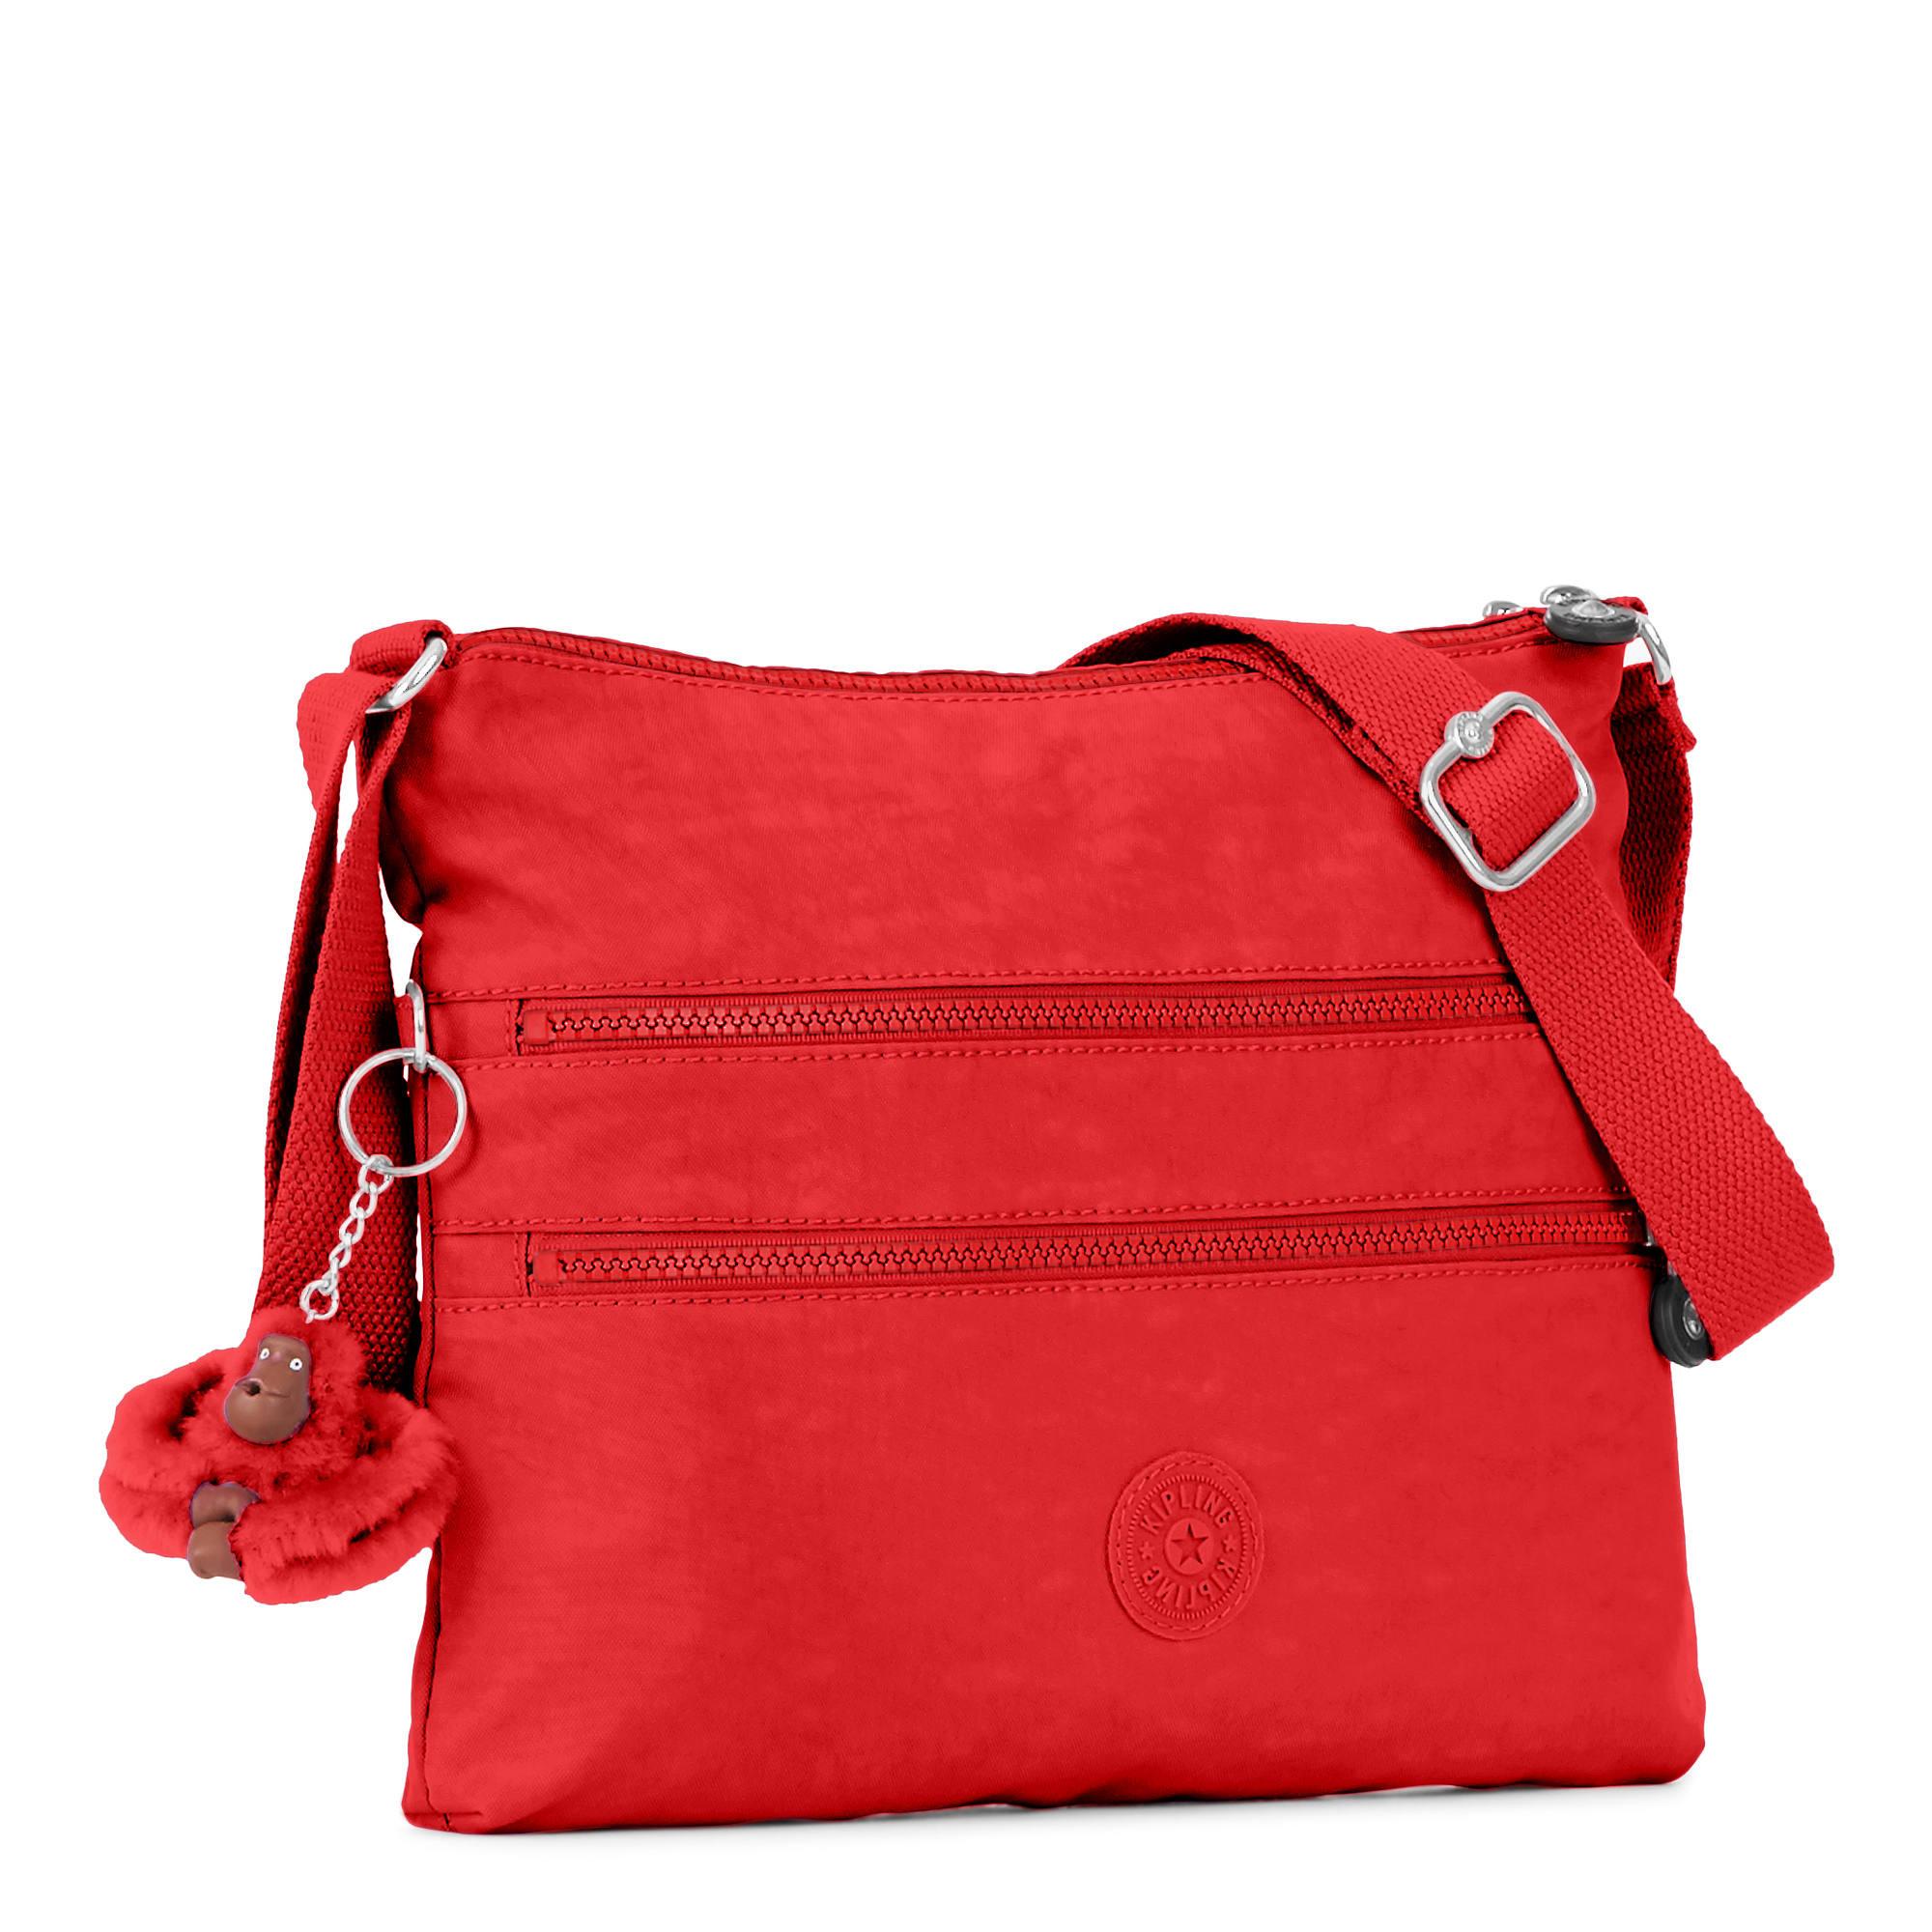 Kipling-Alvar-Metallic-Crossbody-Bag miniature 11